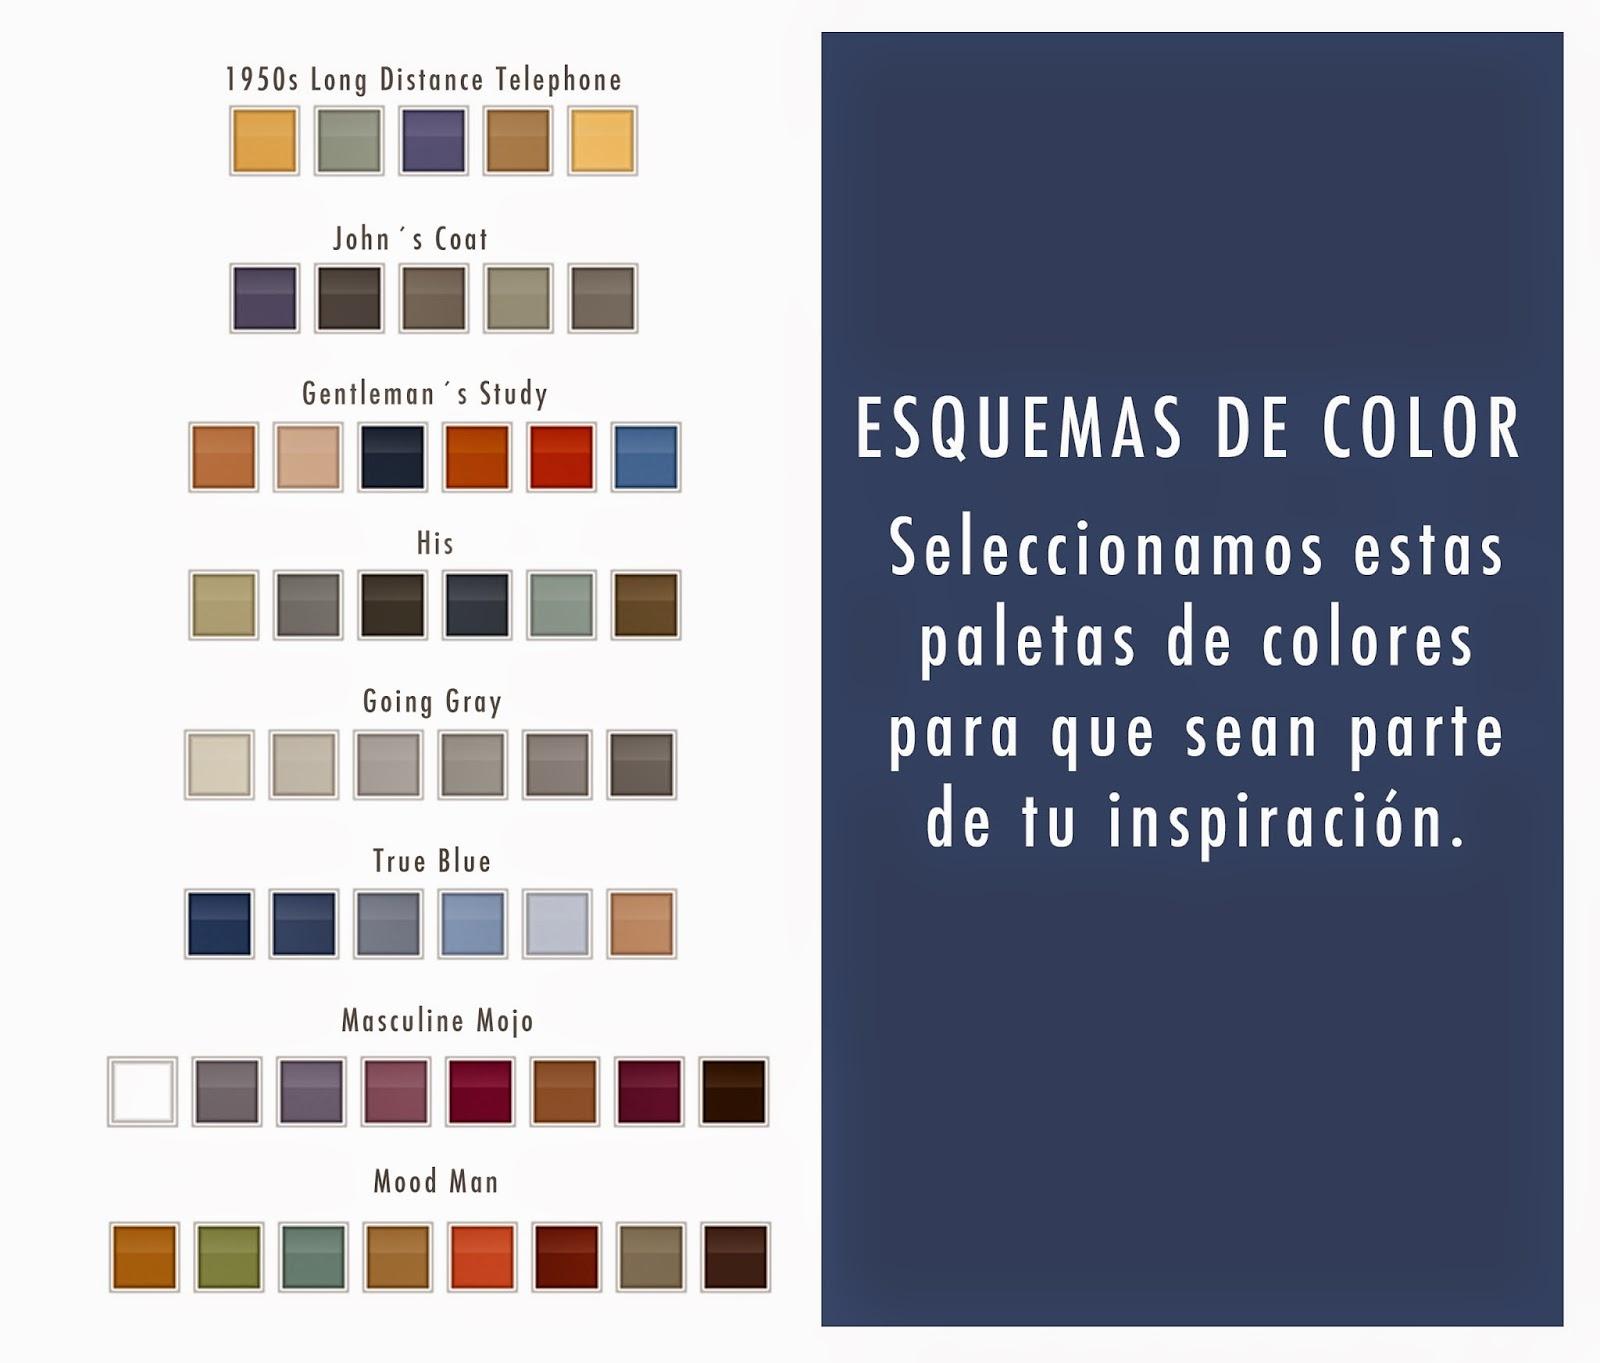 Atelier Taller de Espacios, diseño de interiores guatemala, esquema de color